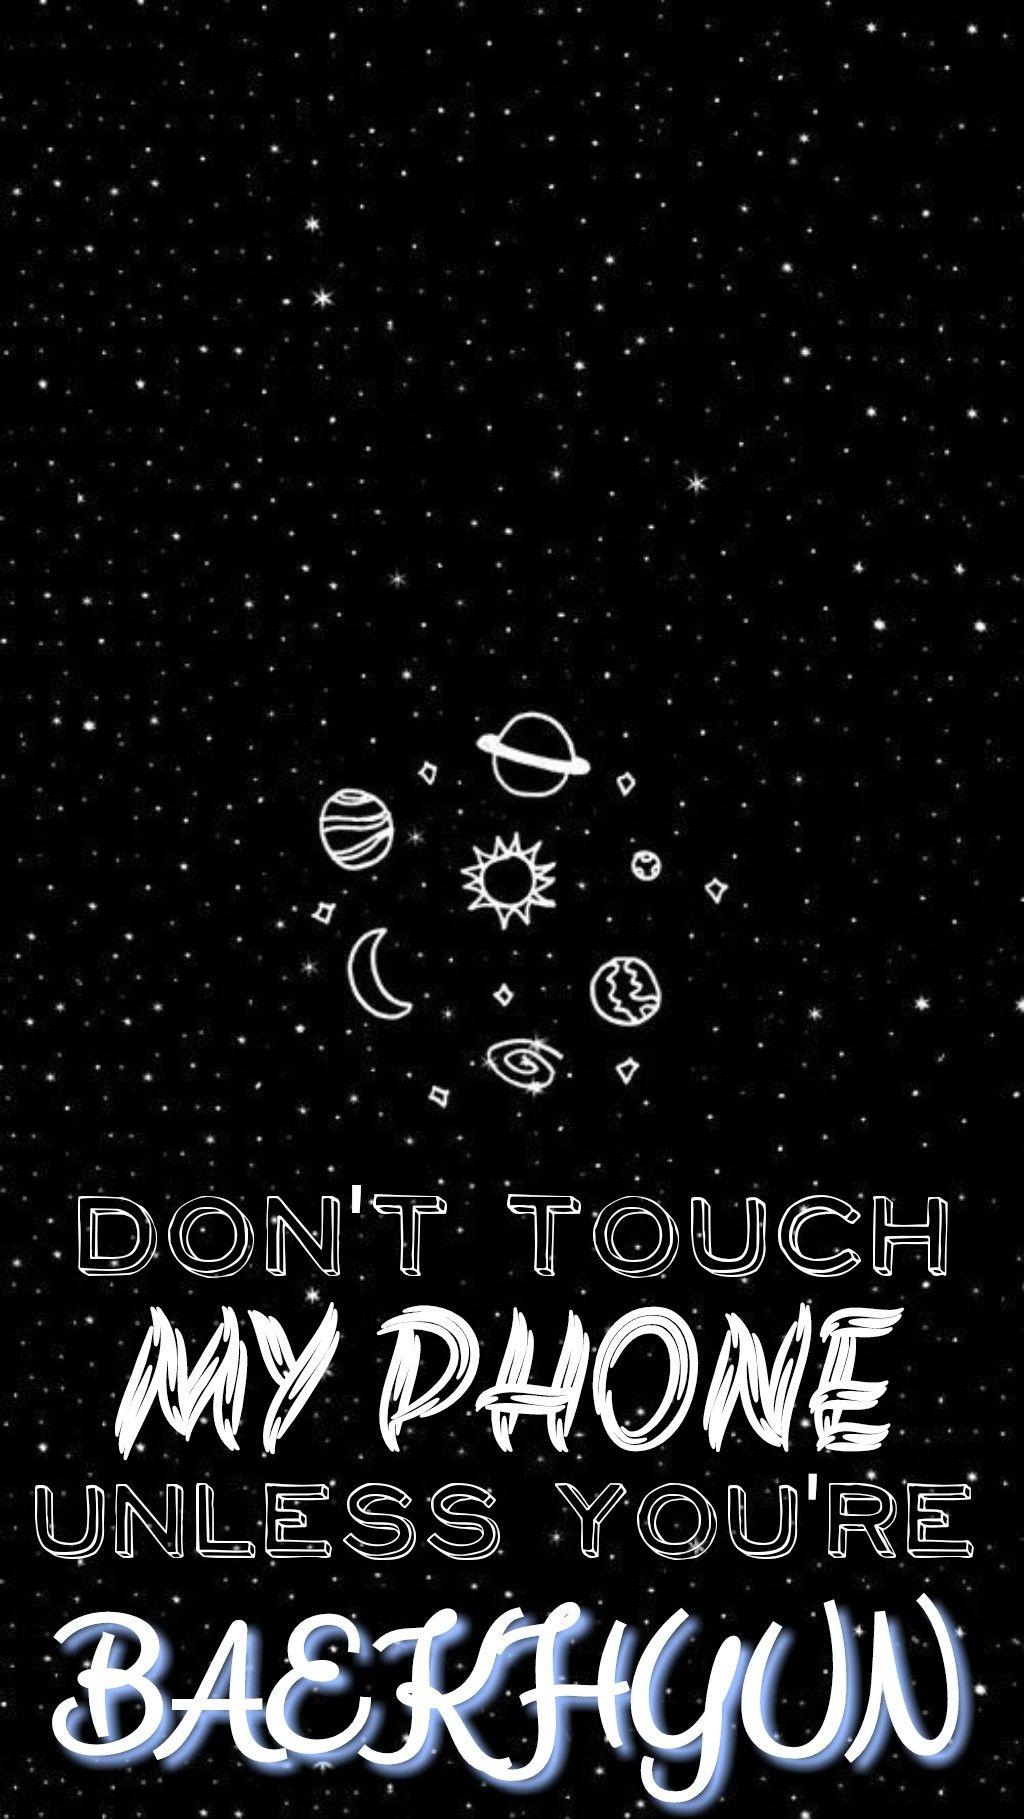 Don T Touch My Phone Unless You Re Baekhyun Exolockscreen Wallpaper Ponsel Gambar Grafis